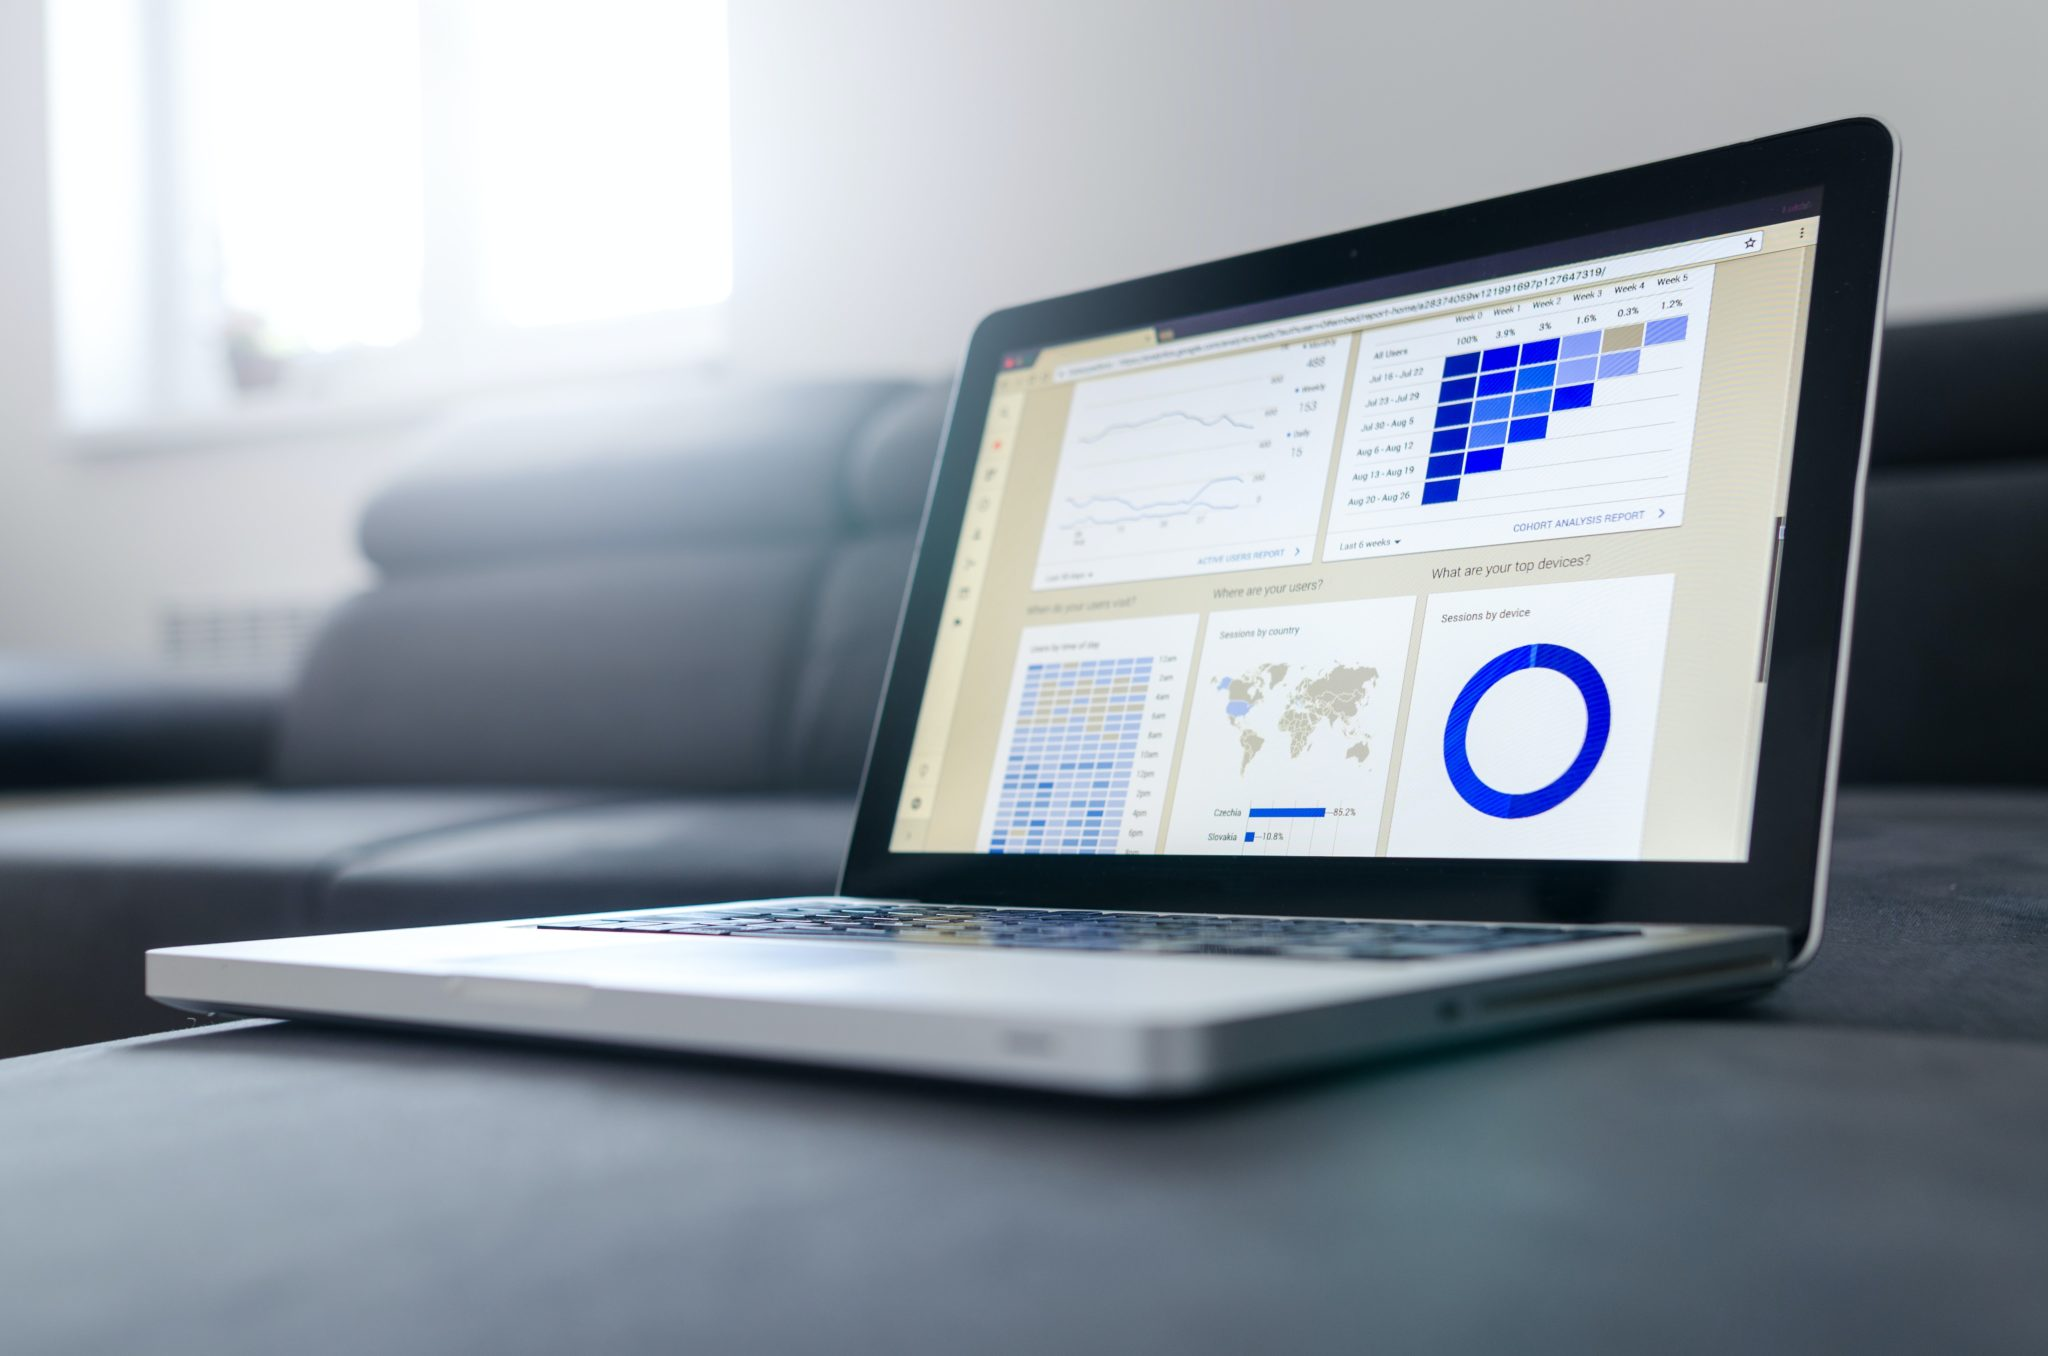 website traffic statistics on laptop